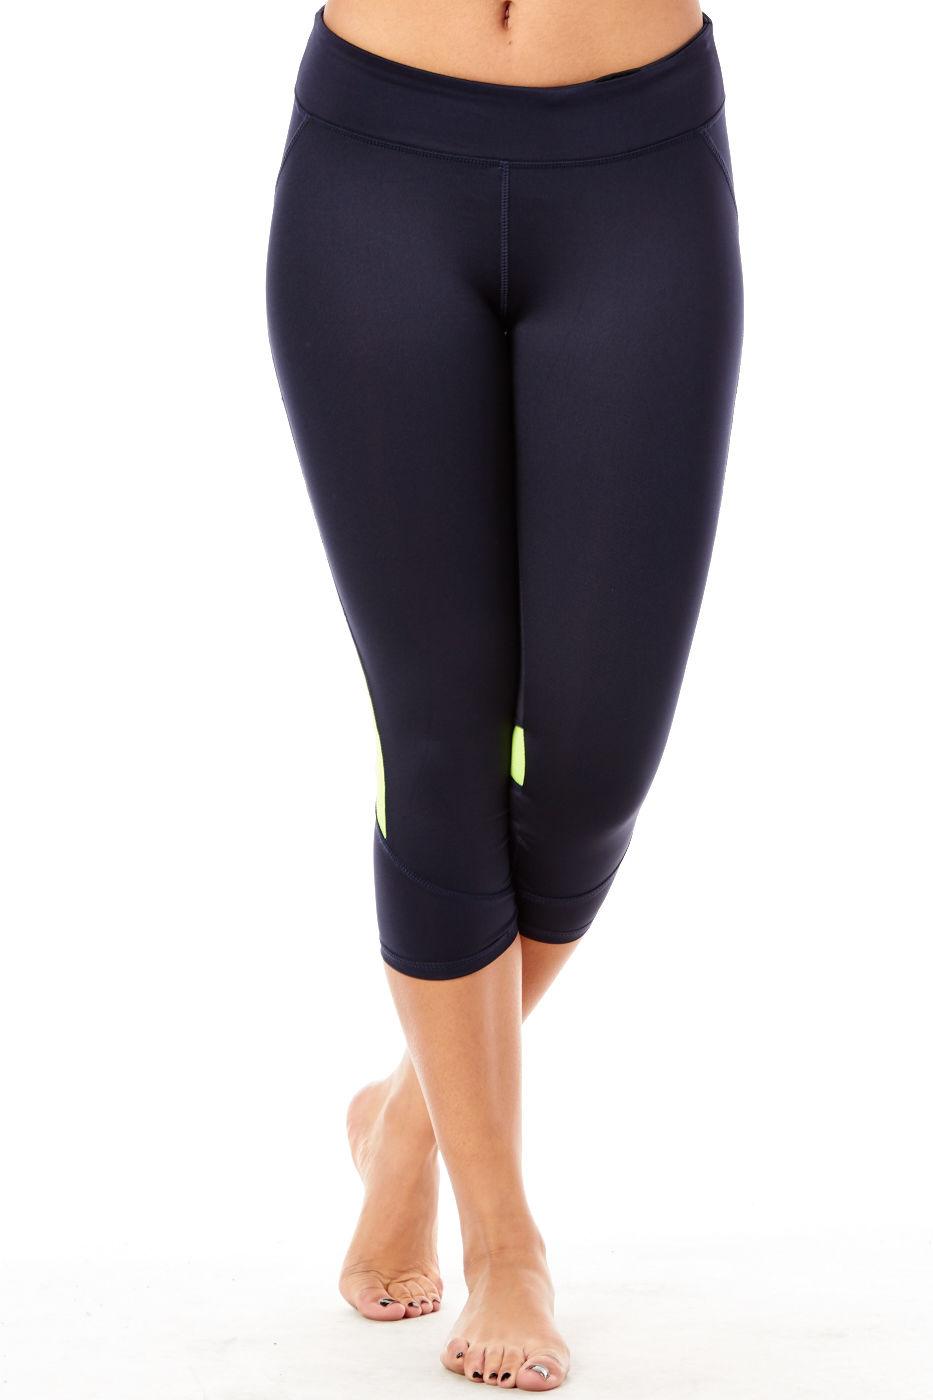 Womens Ladies Juniors Great USA Tight Active Capri Pants